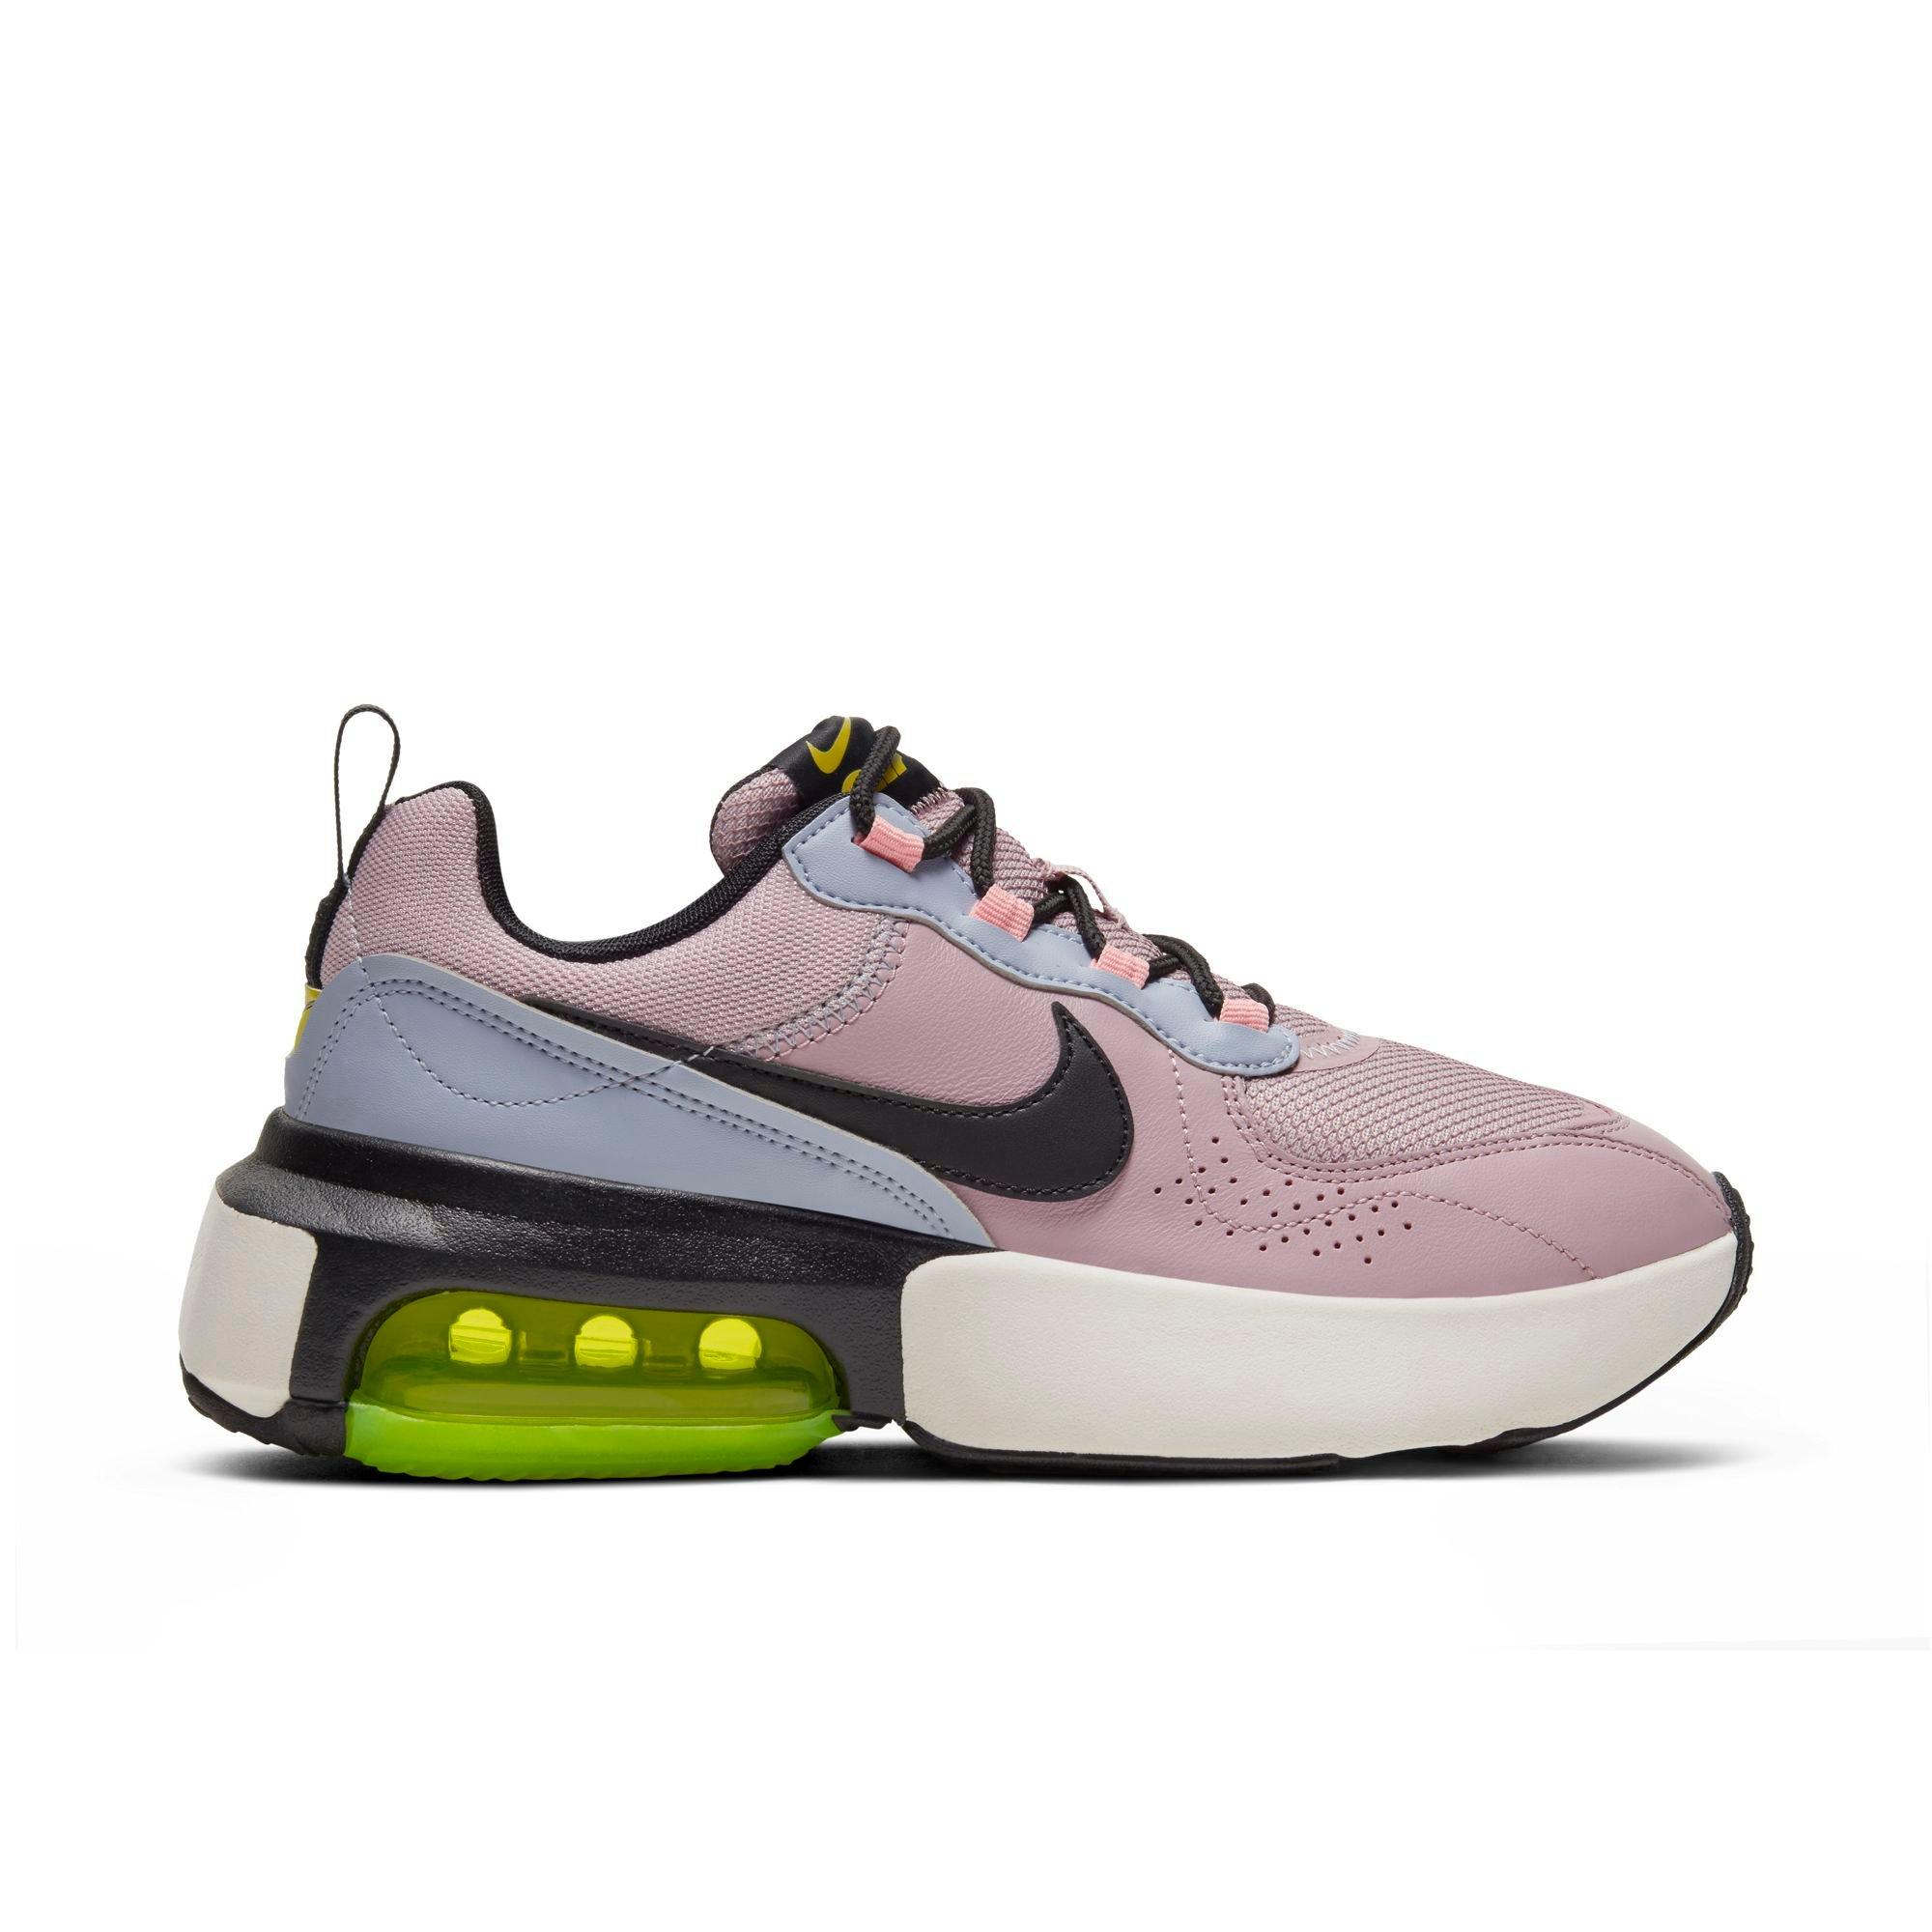 mizuno mens running shoes size 9 youth gold toe twist quiz